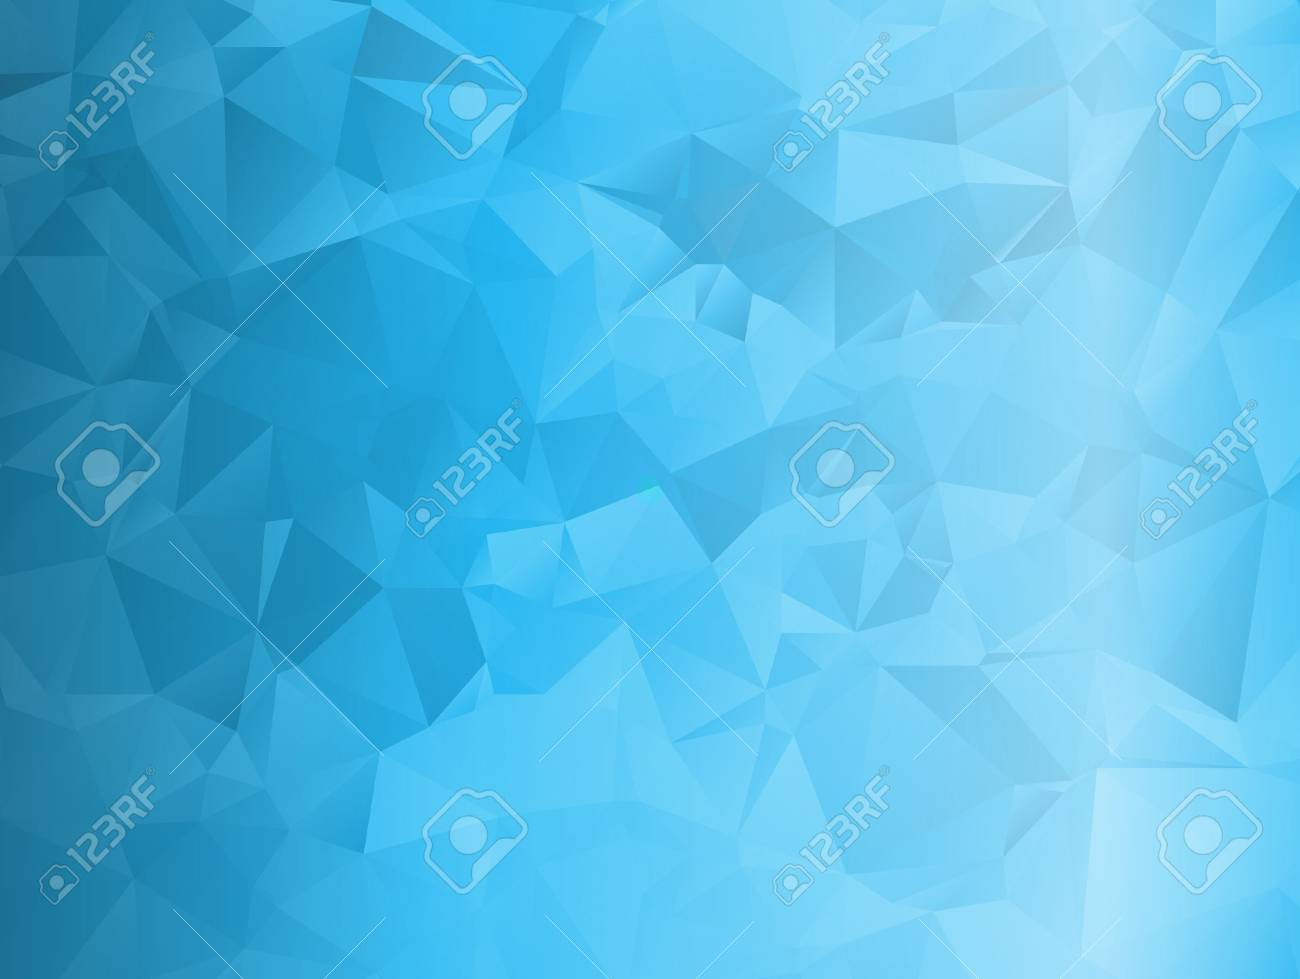 Polygonal Mosaic Background, Vector illustration, Business Design Templates - 39575133